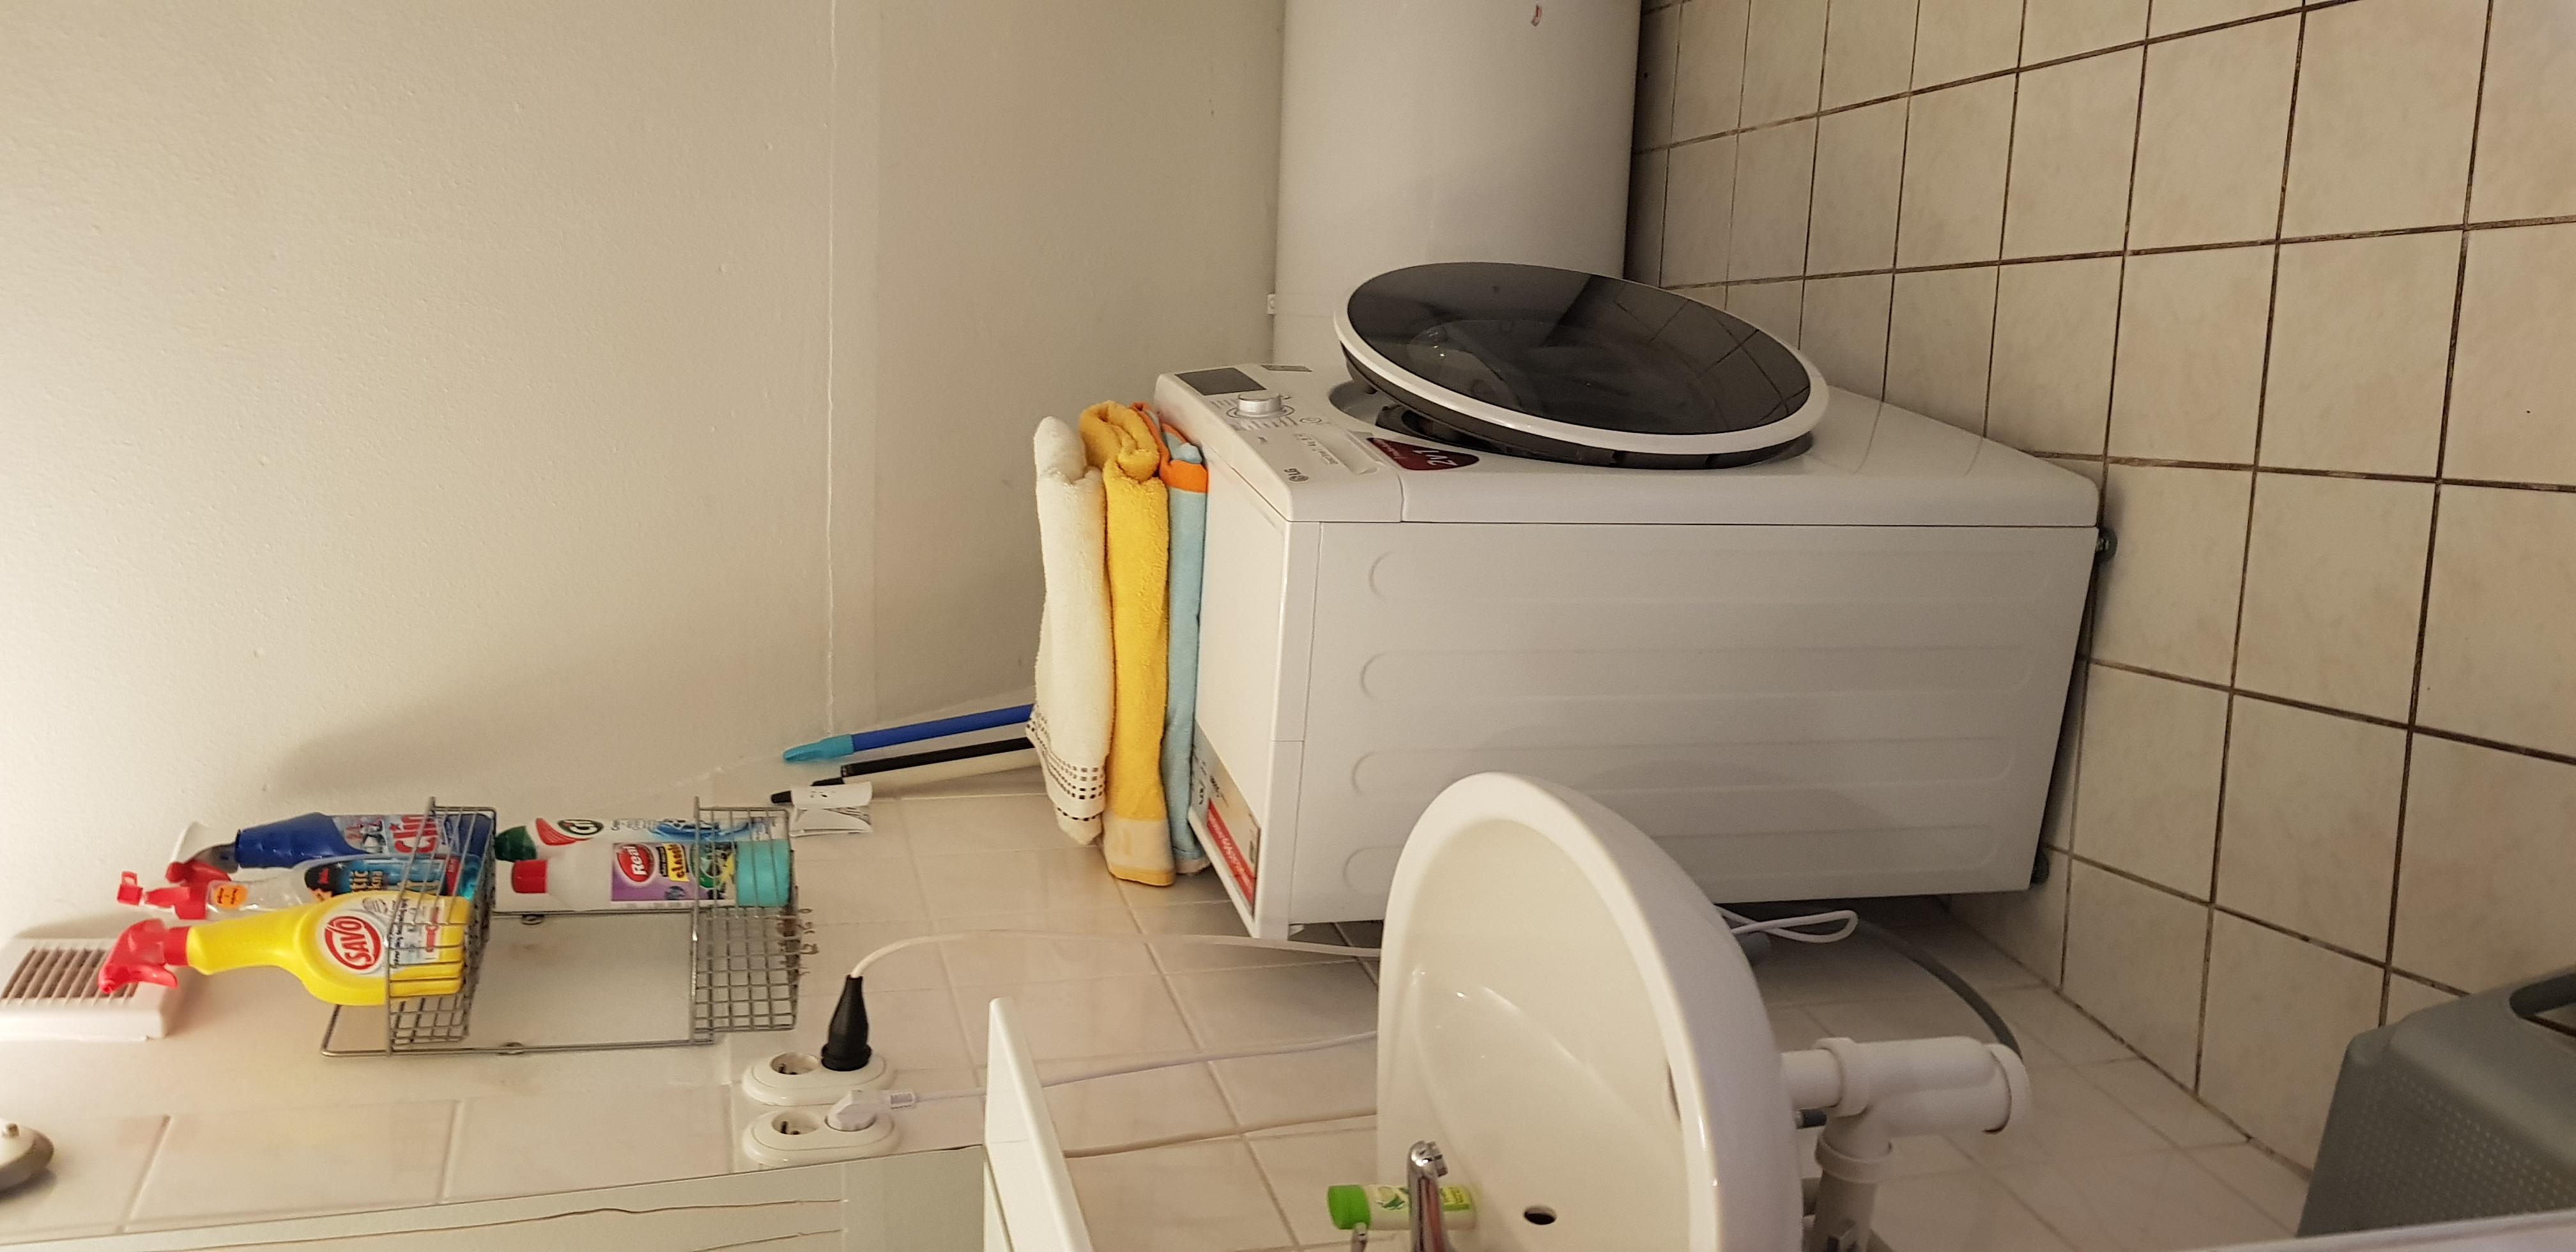 WC, sprcha, pračka se sušičkou